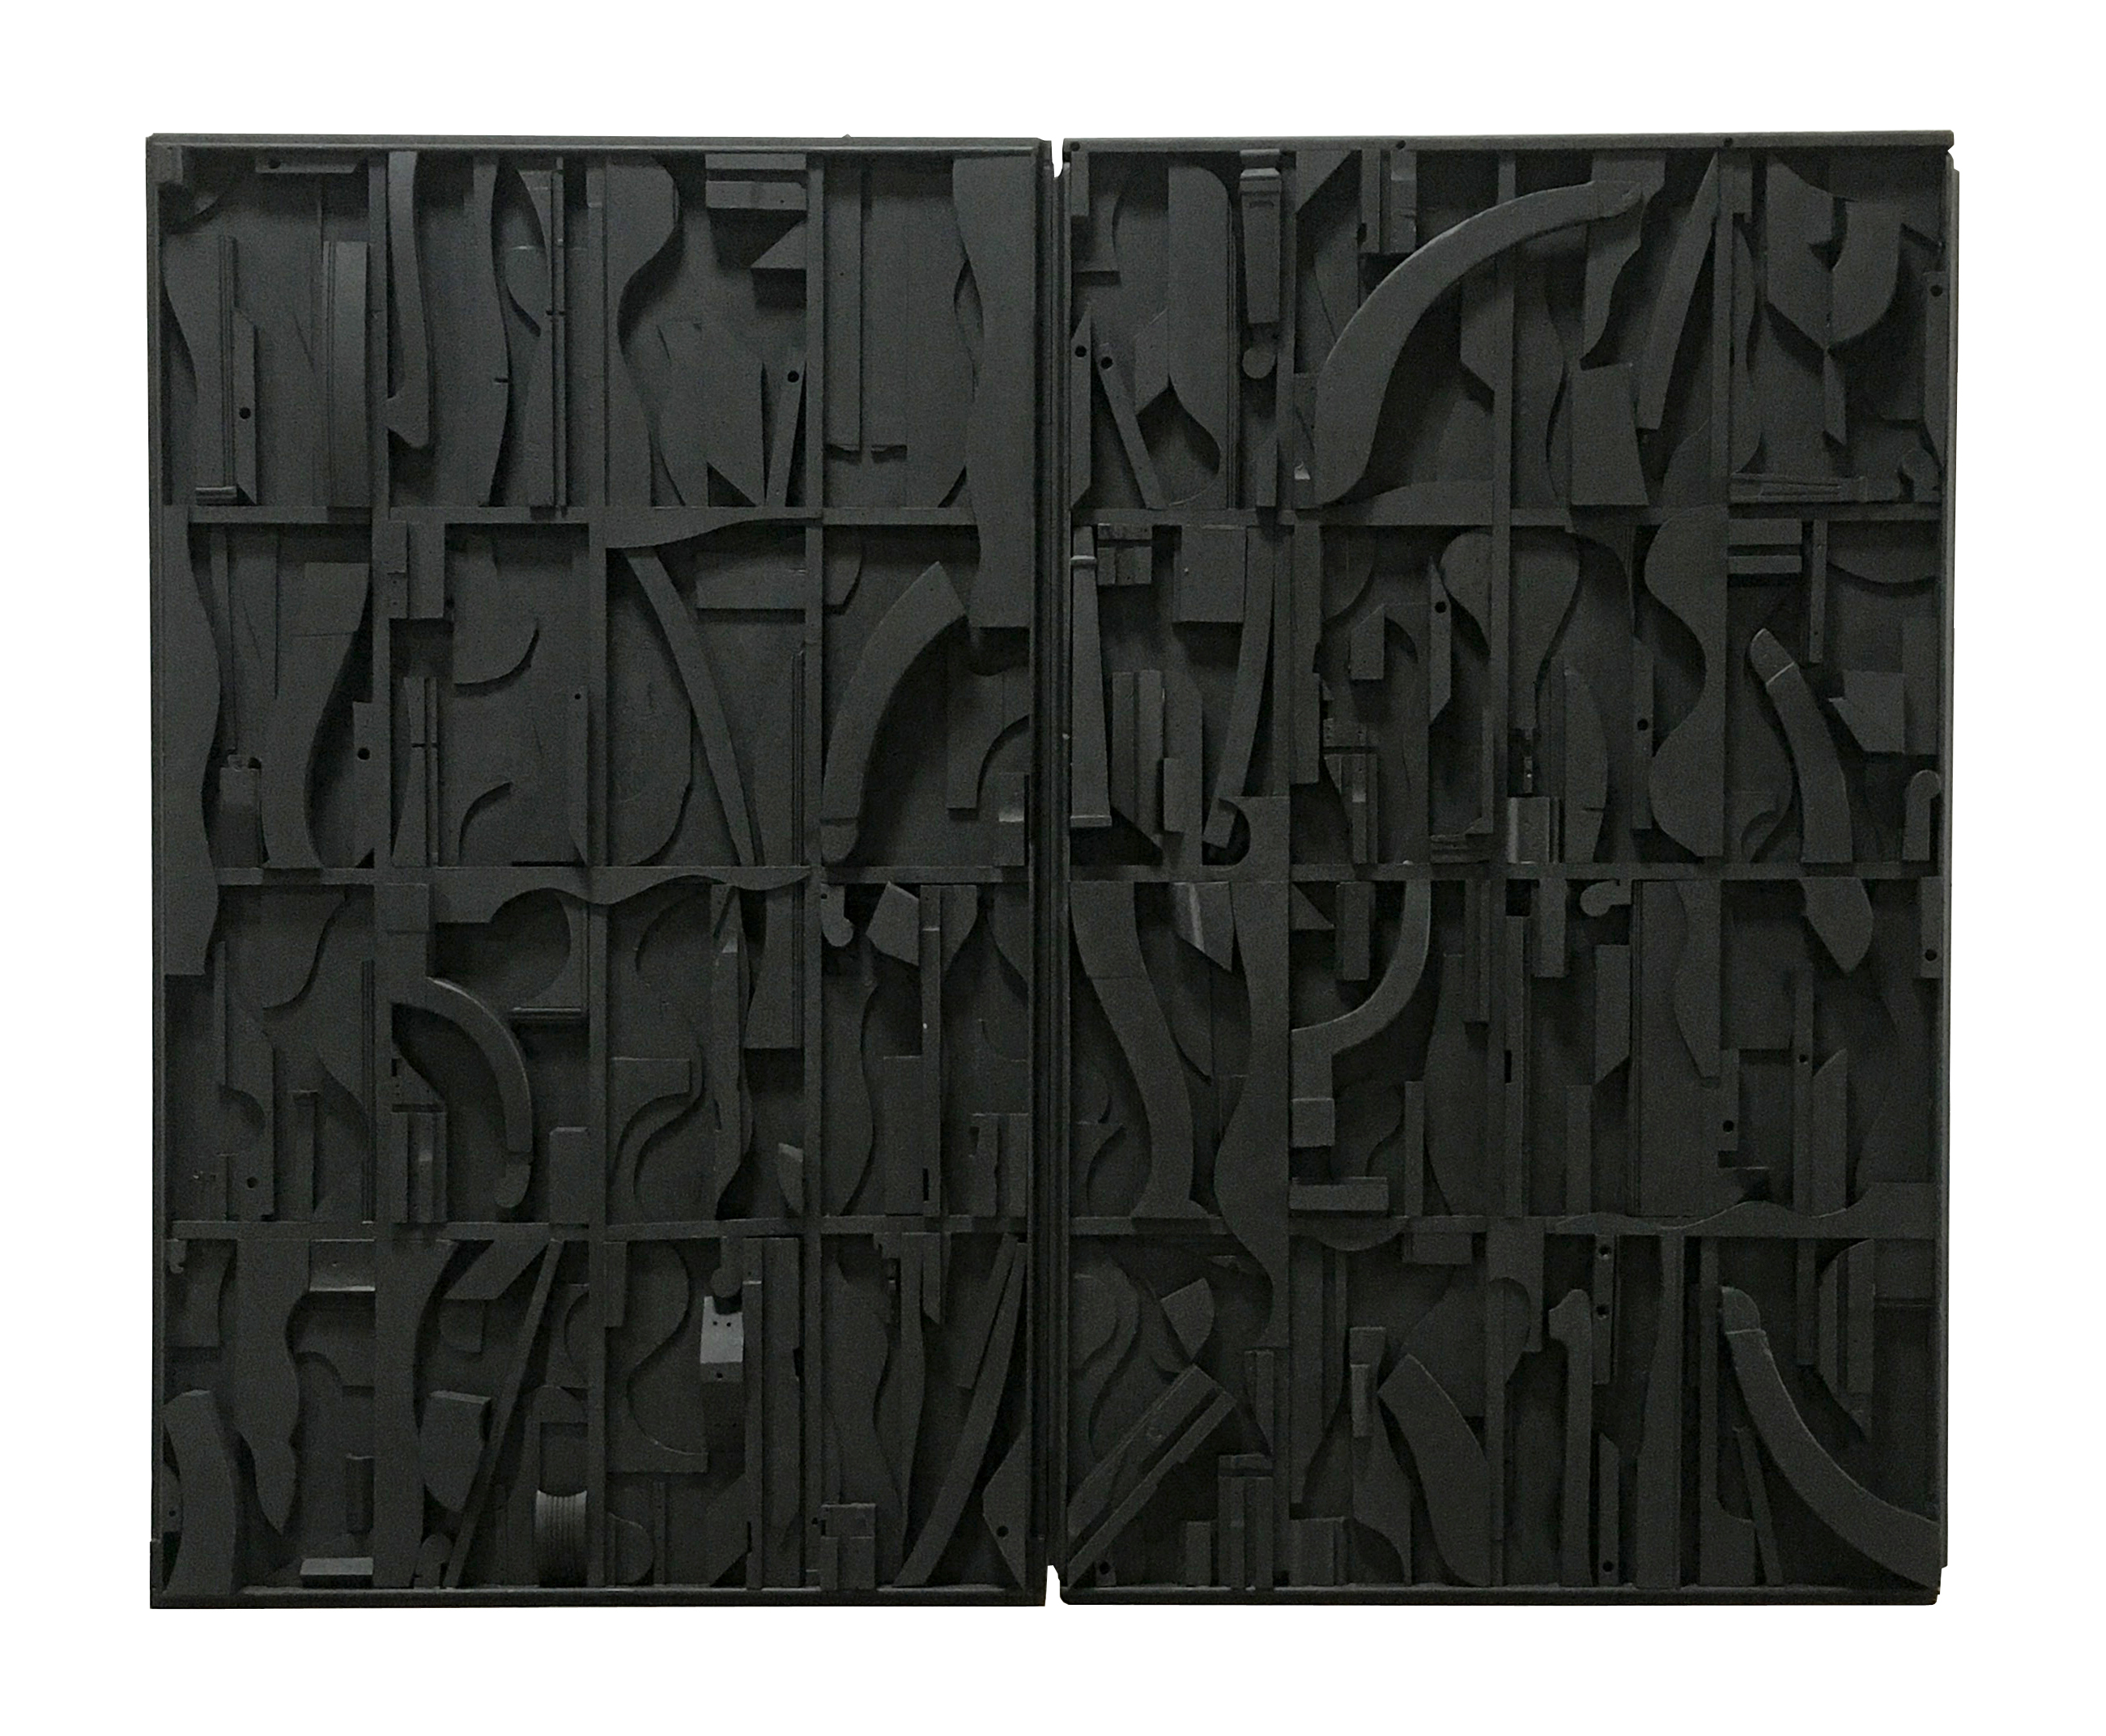 Tony_Brown_Wall_ Installation